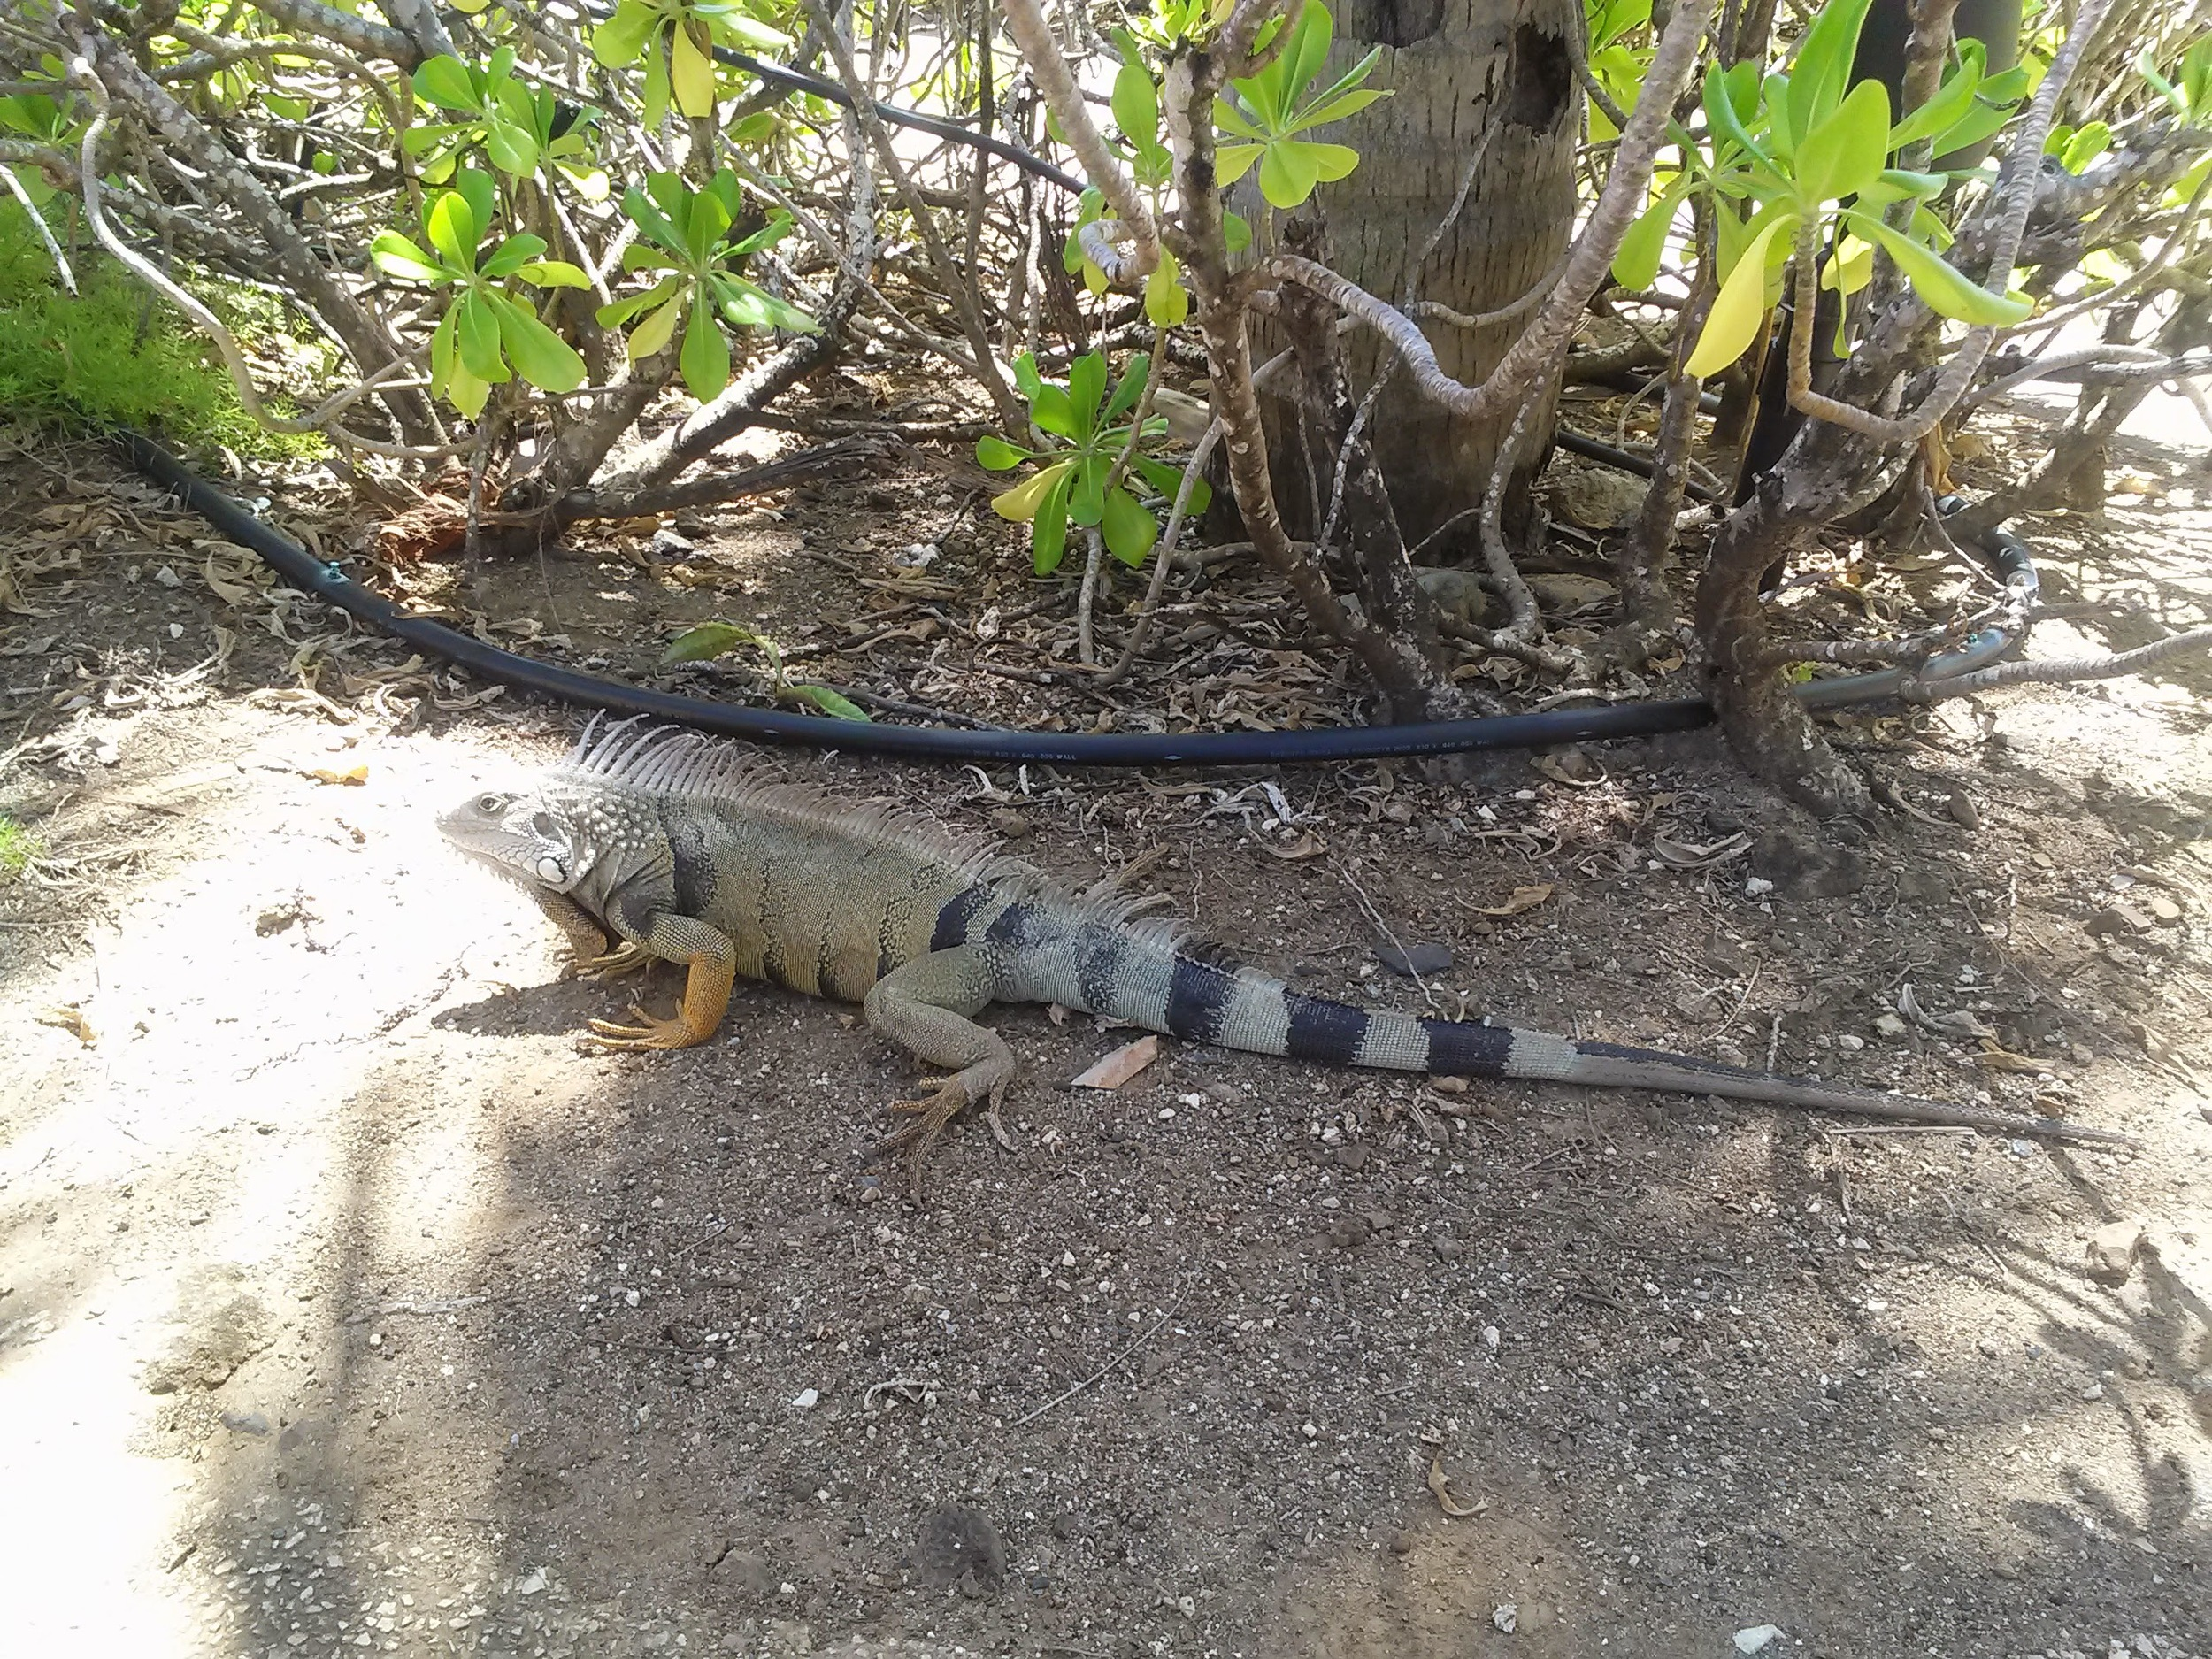 A free range, pasture-raised iguana?! More protein! ;)